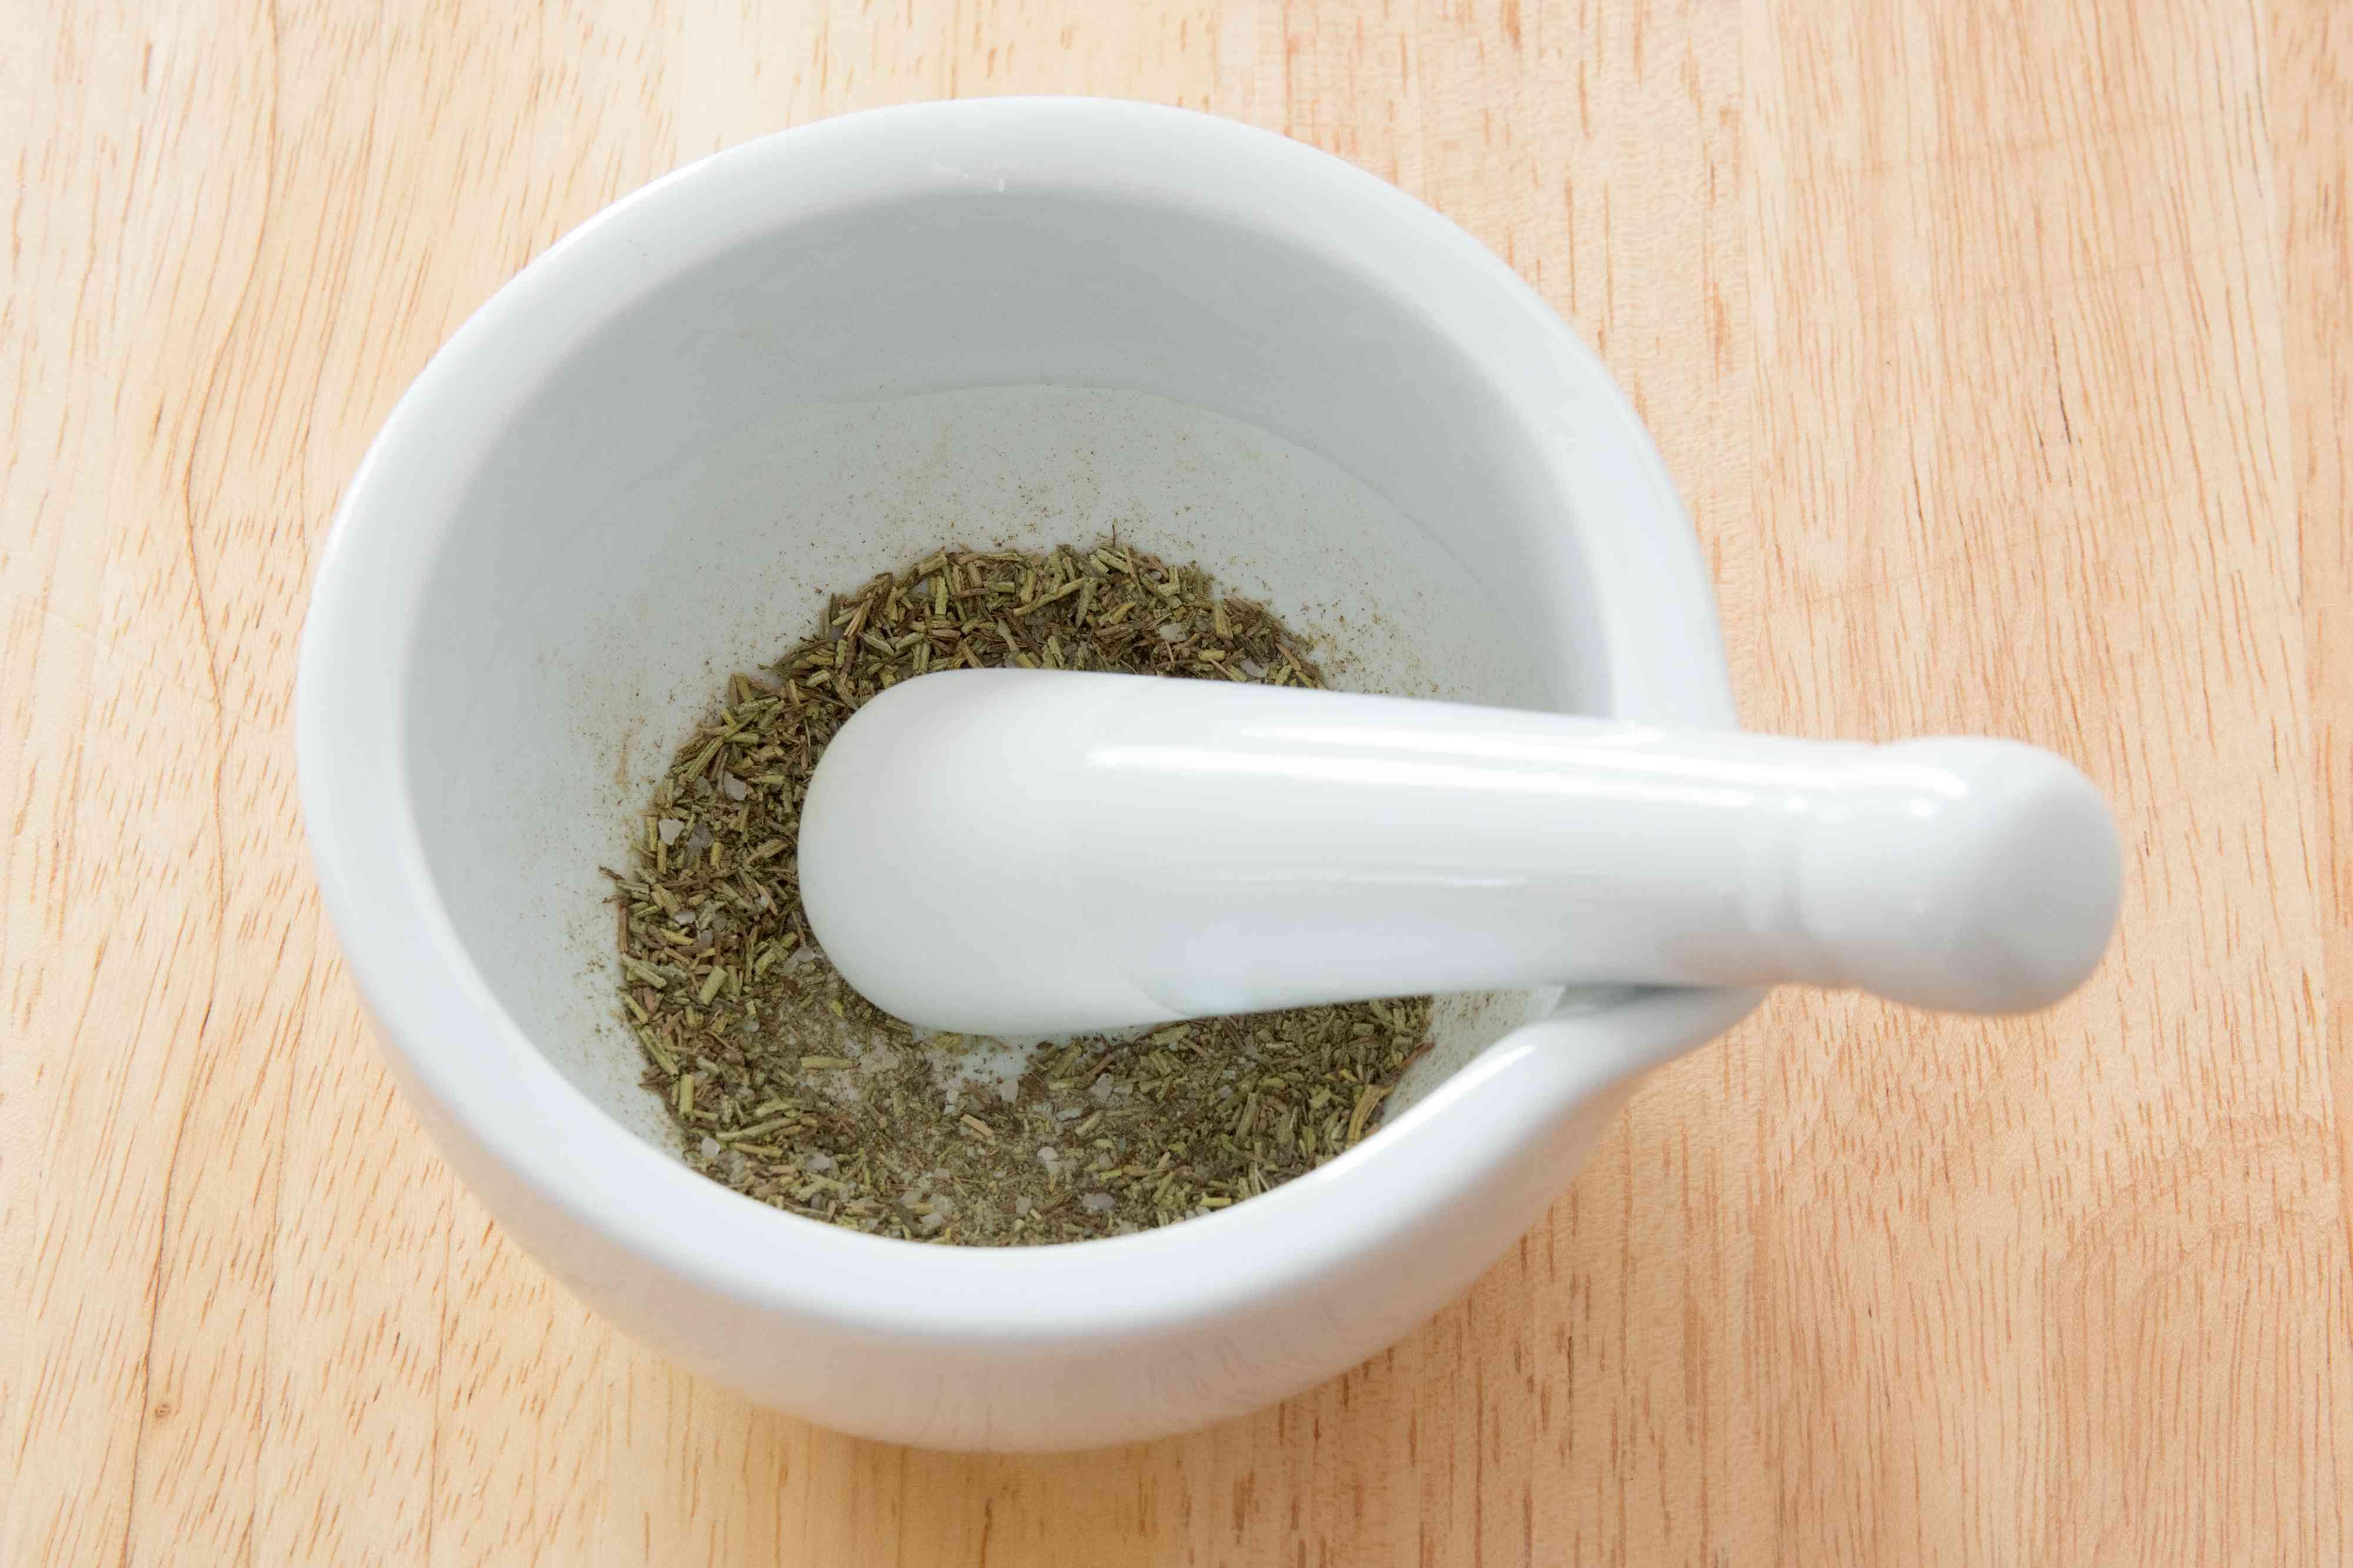 Rosemary-Thyme Salt for Irish Nachos